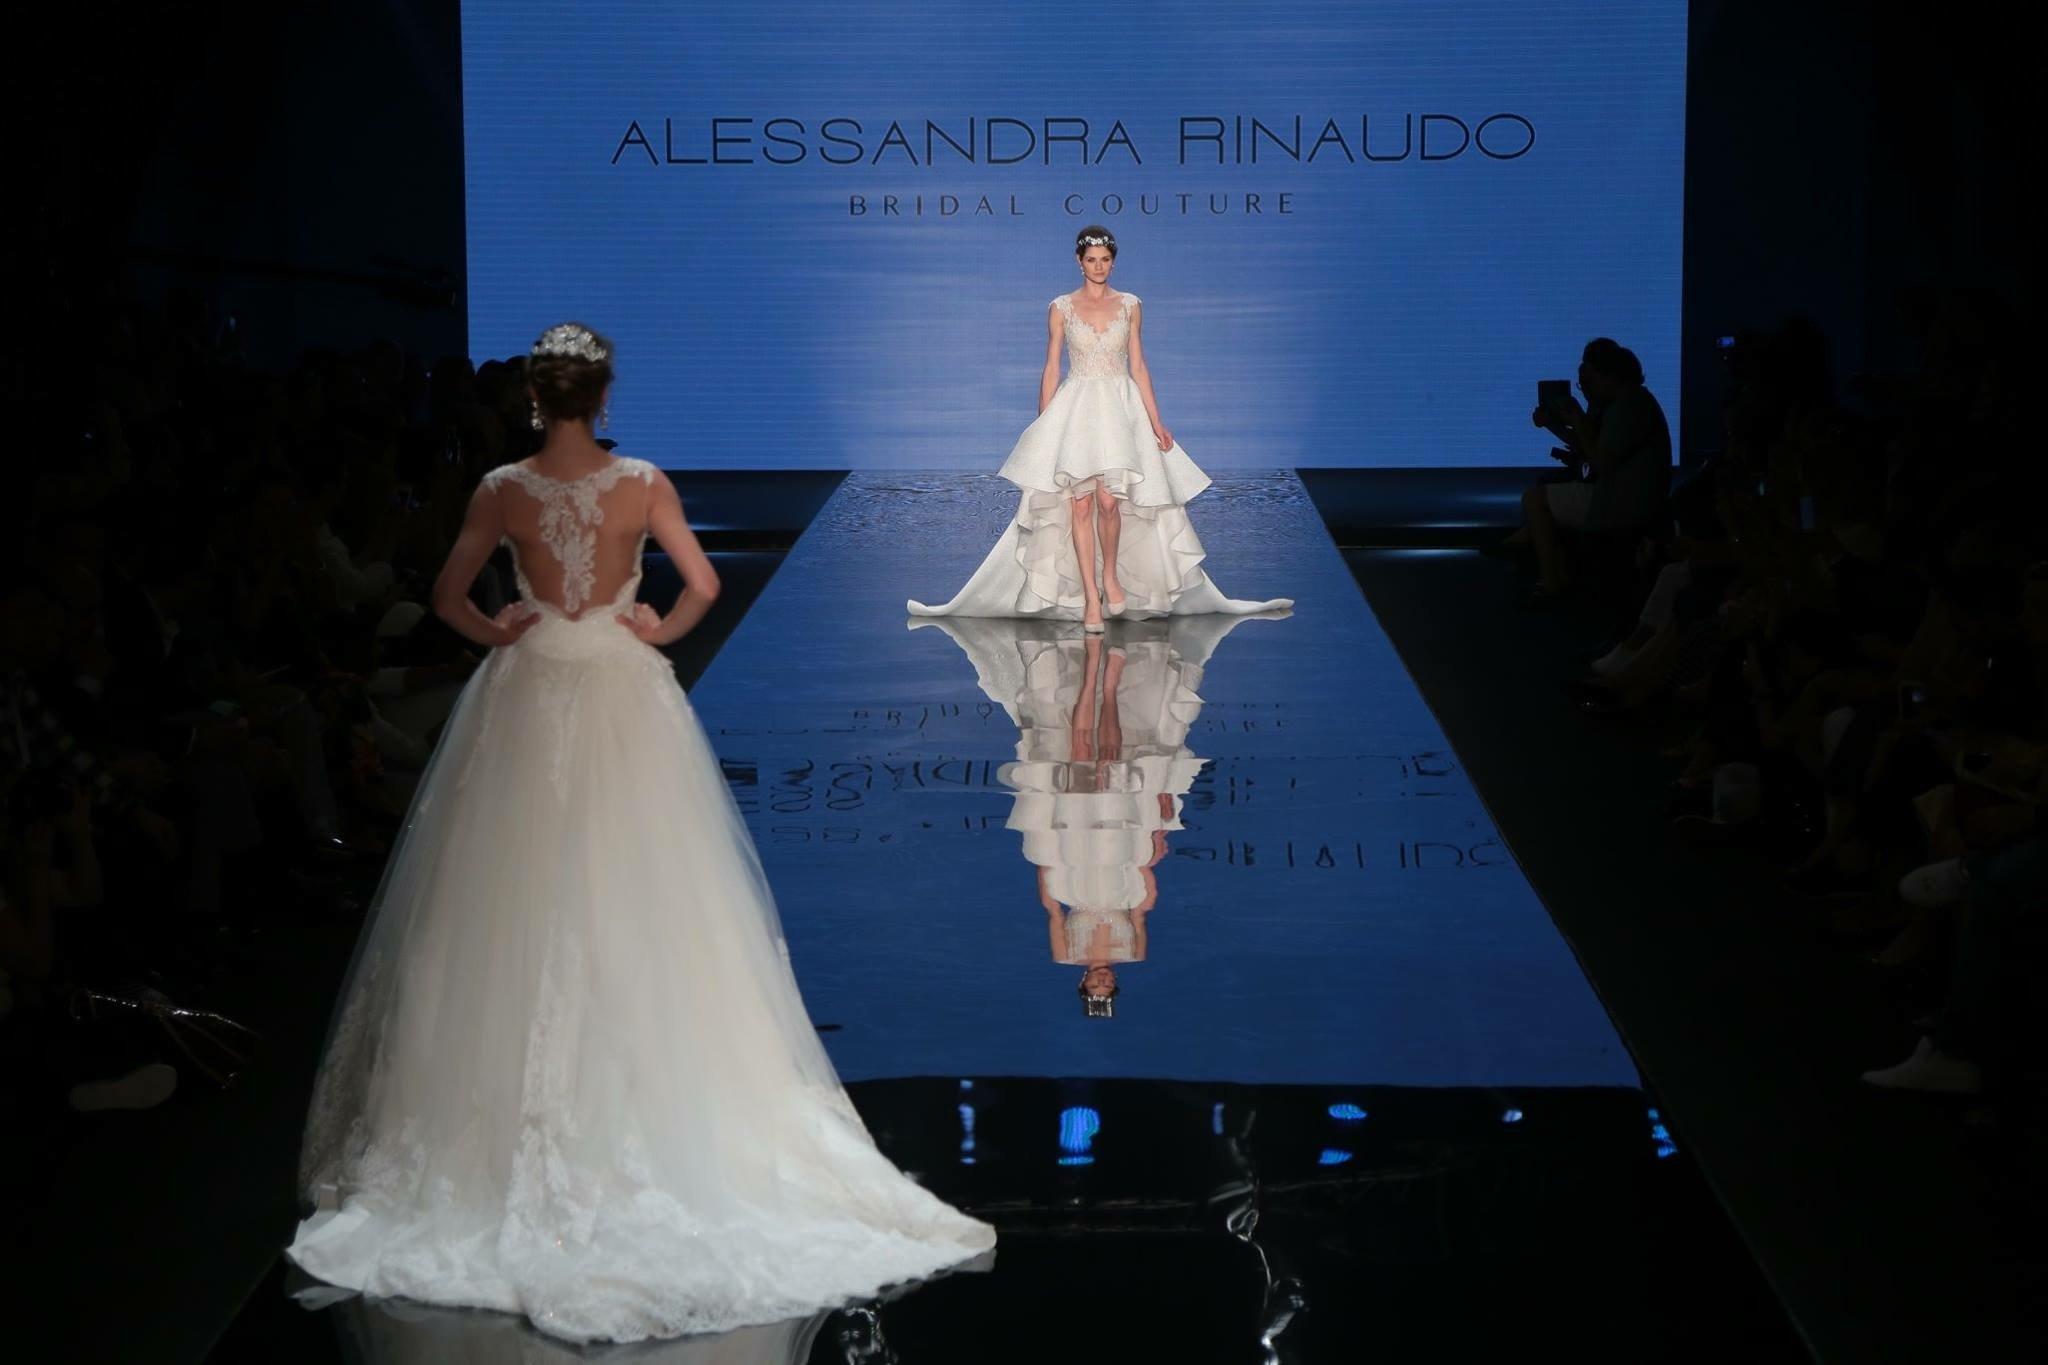 ee4afb2541b2 ... Alessandra Rinaudo Bridal Couture 2017. di Elisa Cornelli. View Gallery  13 Photos. Panorama Sposi. 1